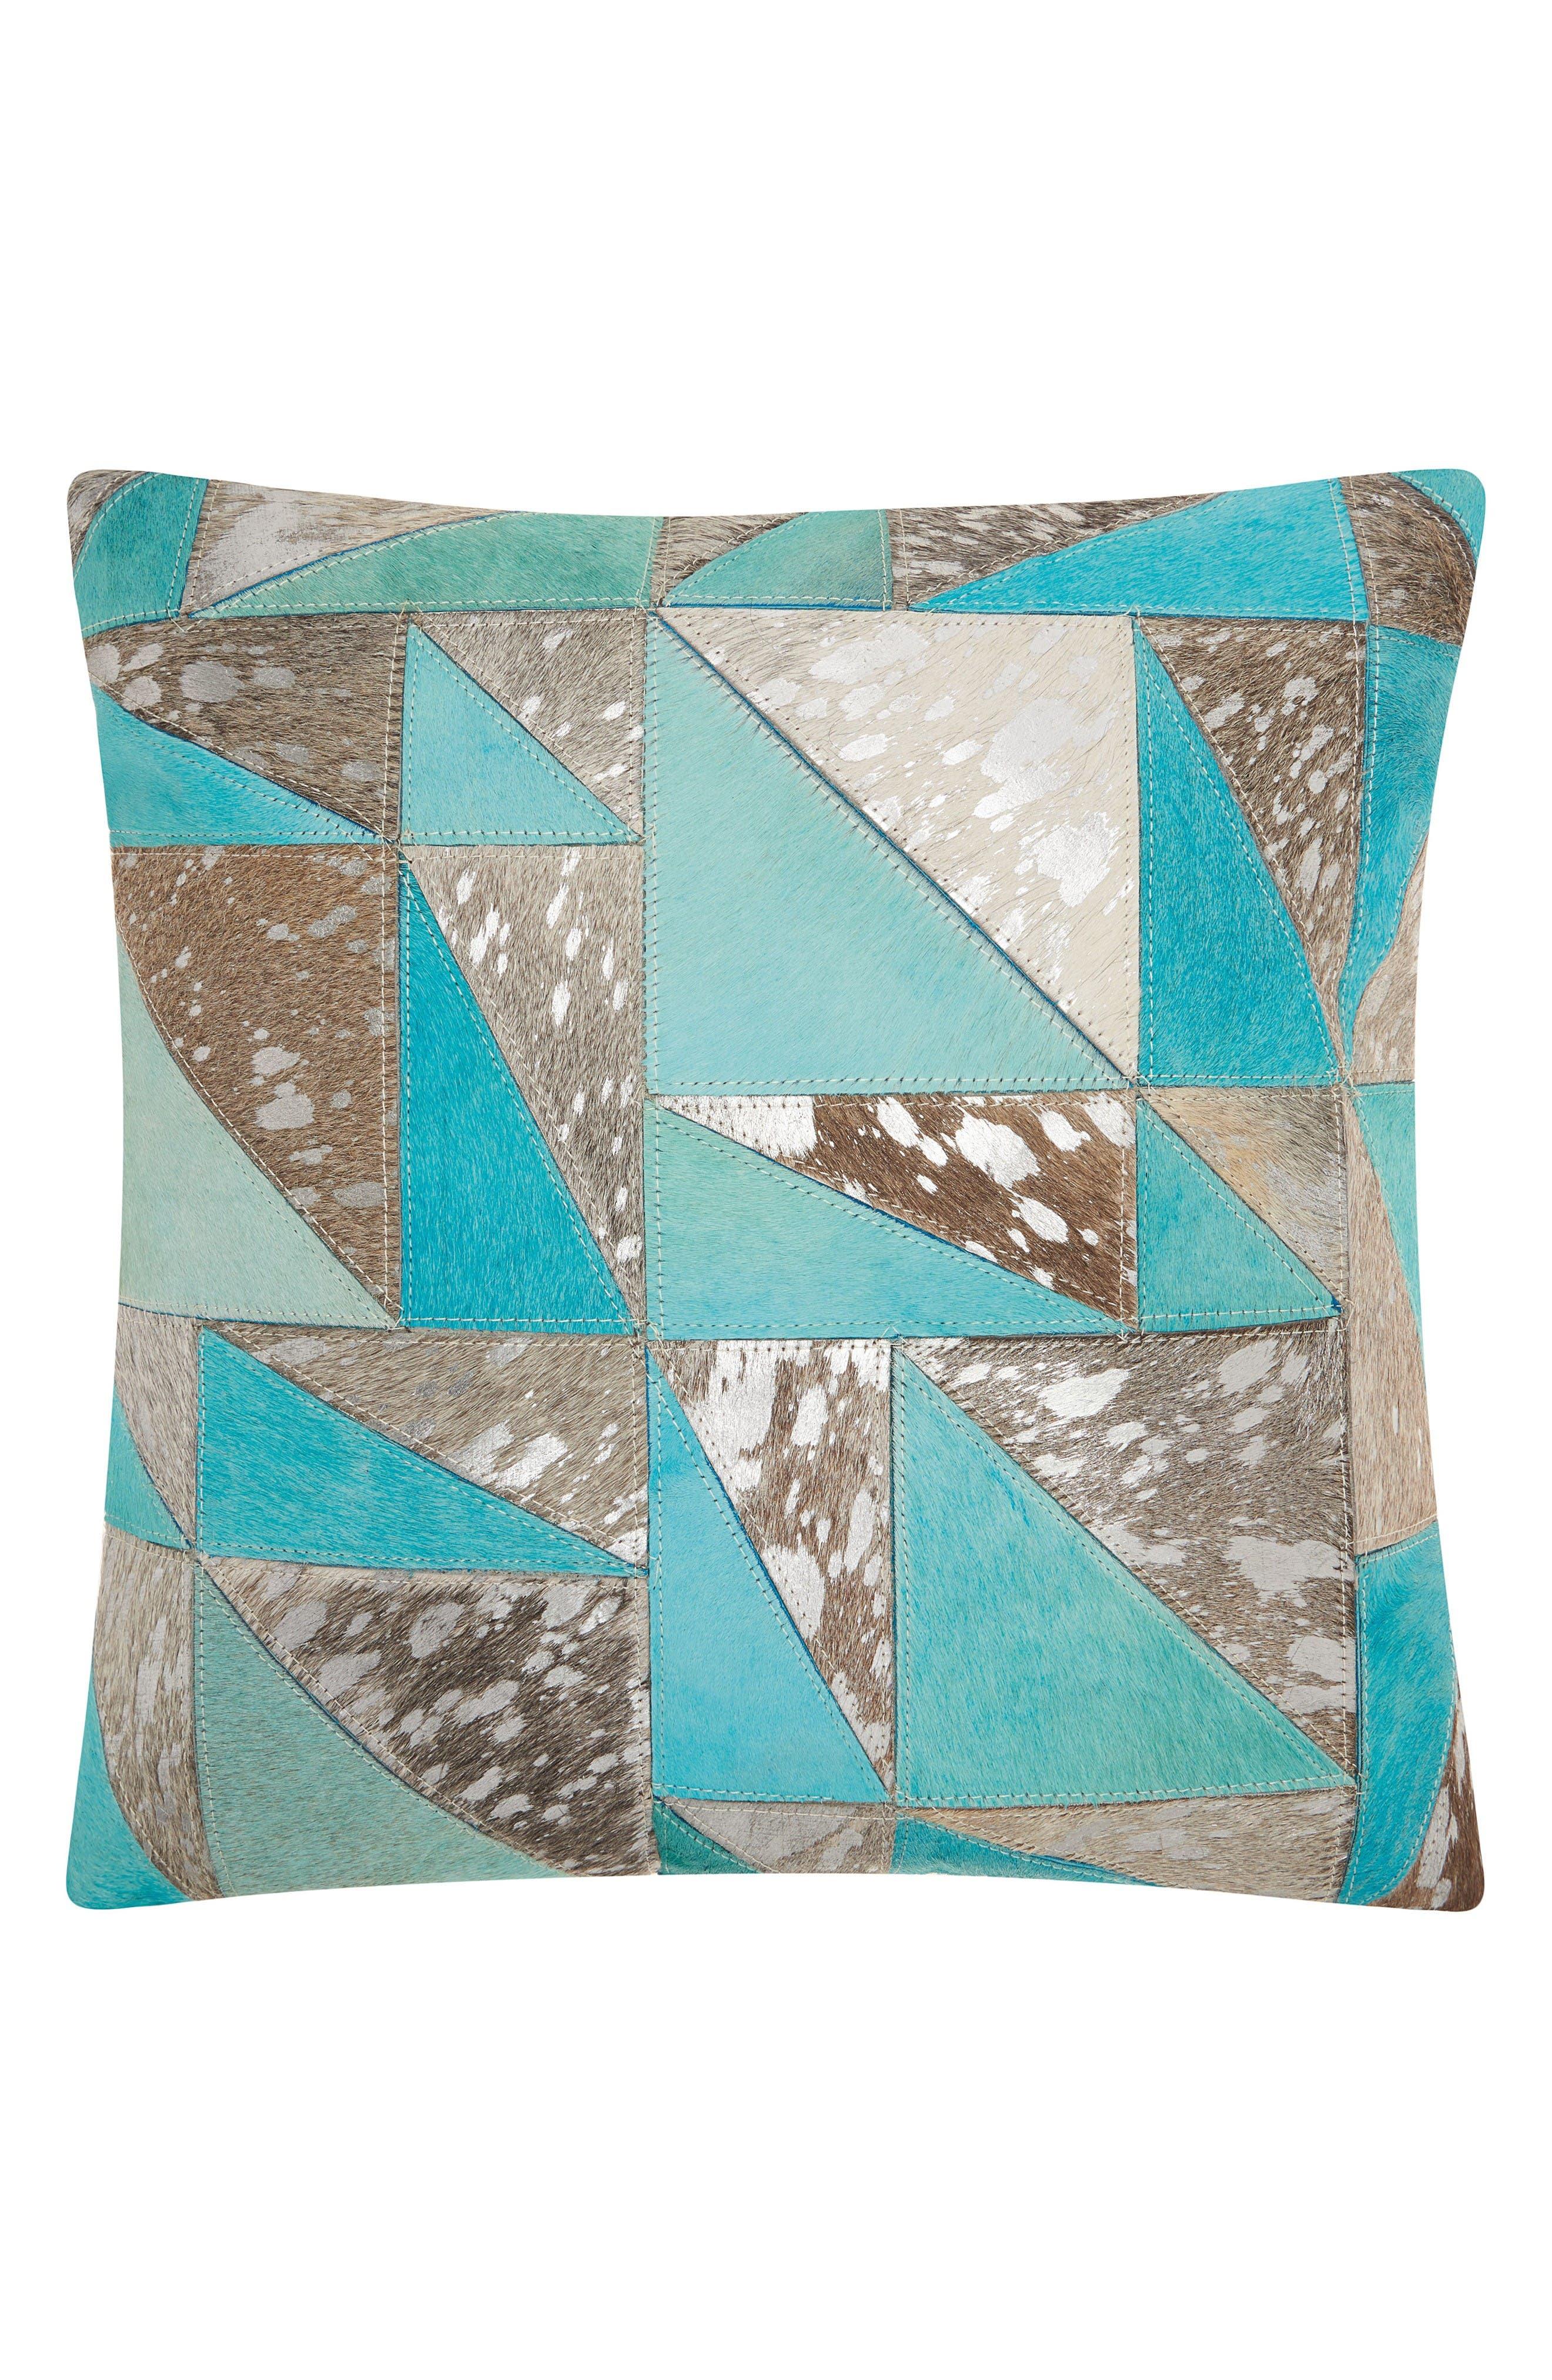 Metallic Calf Hair Accent Pillow,                         Main,                         color, Aqua/ Silver